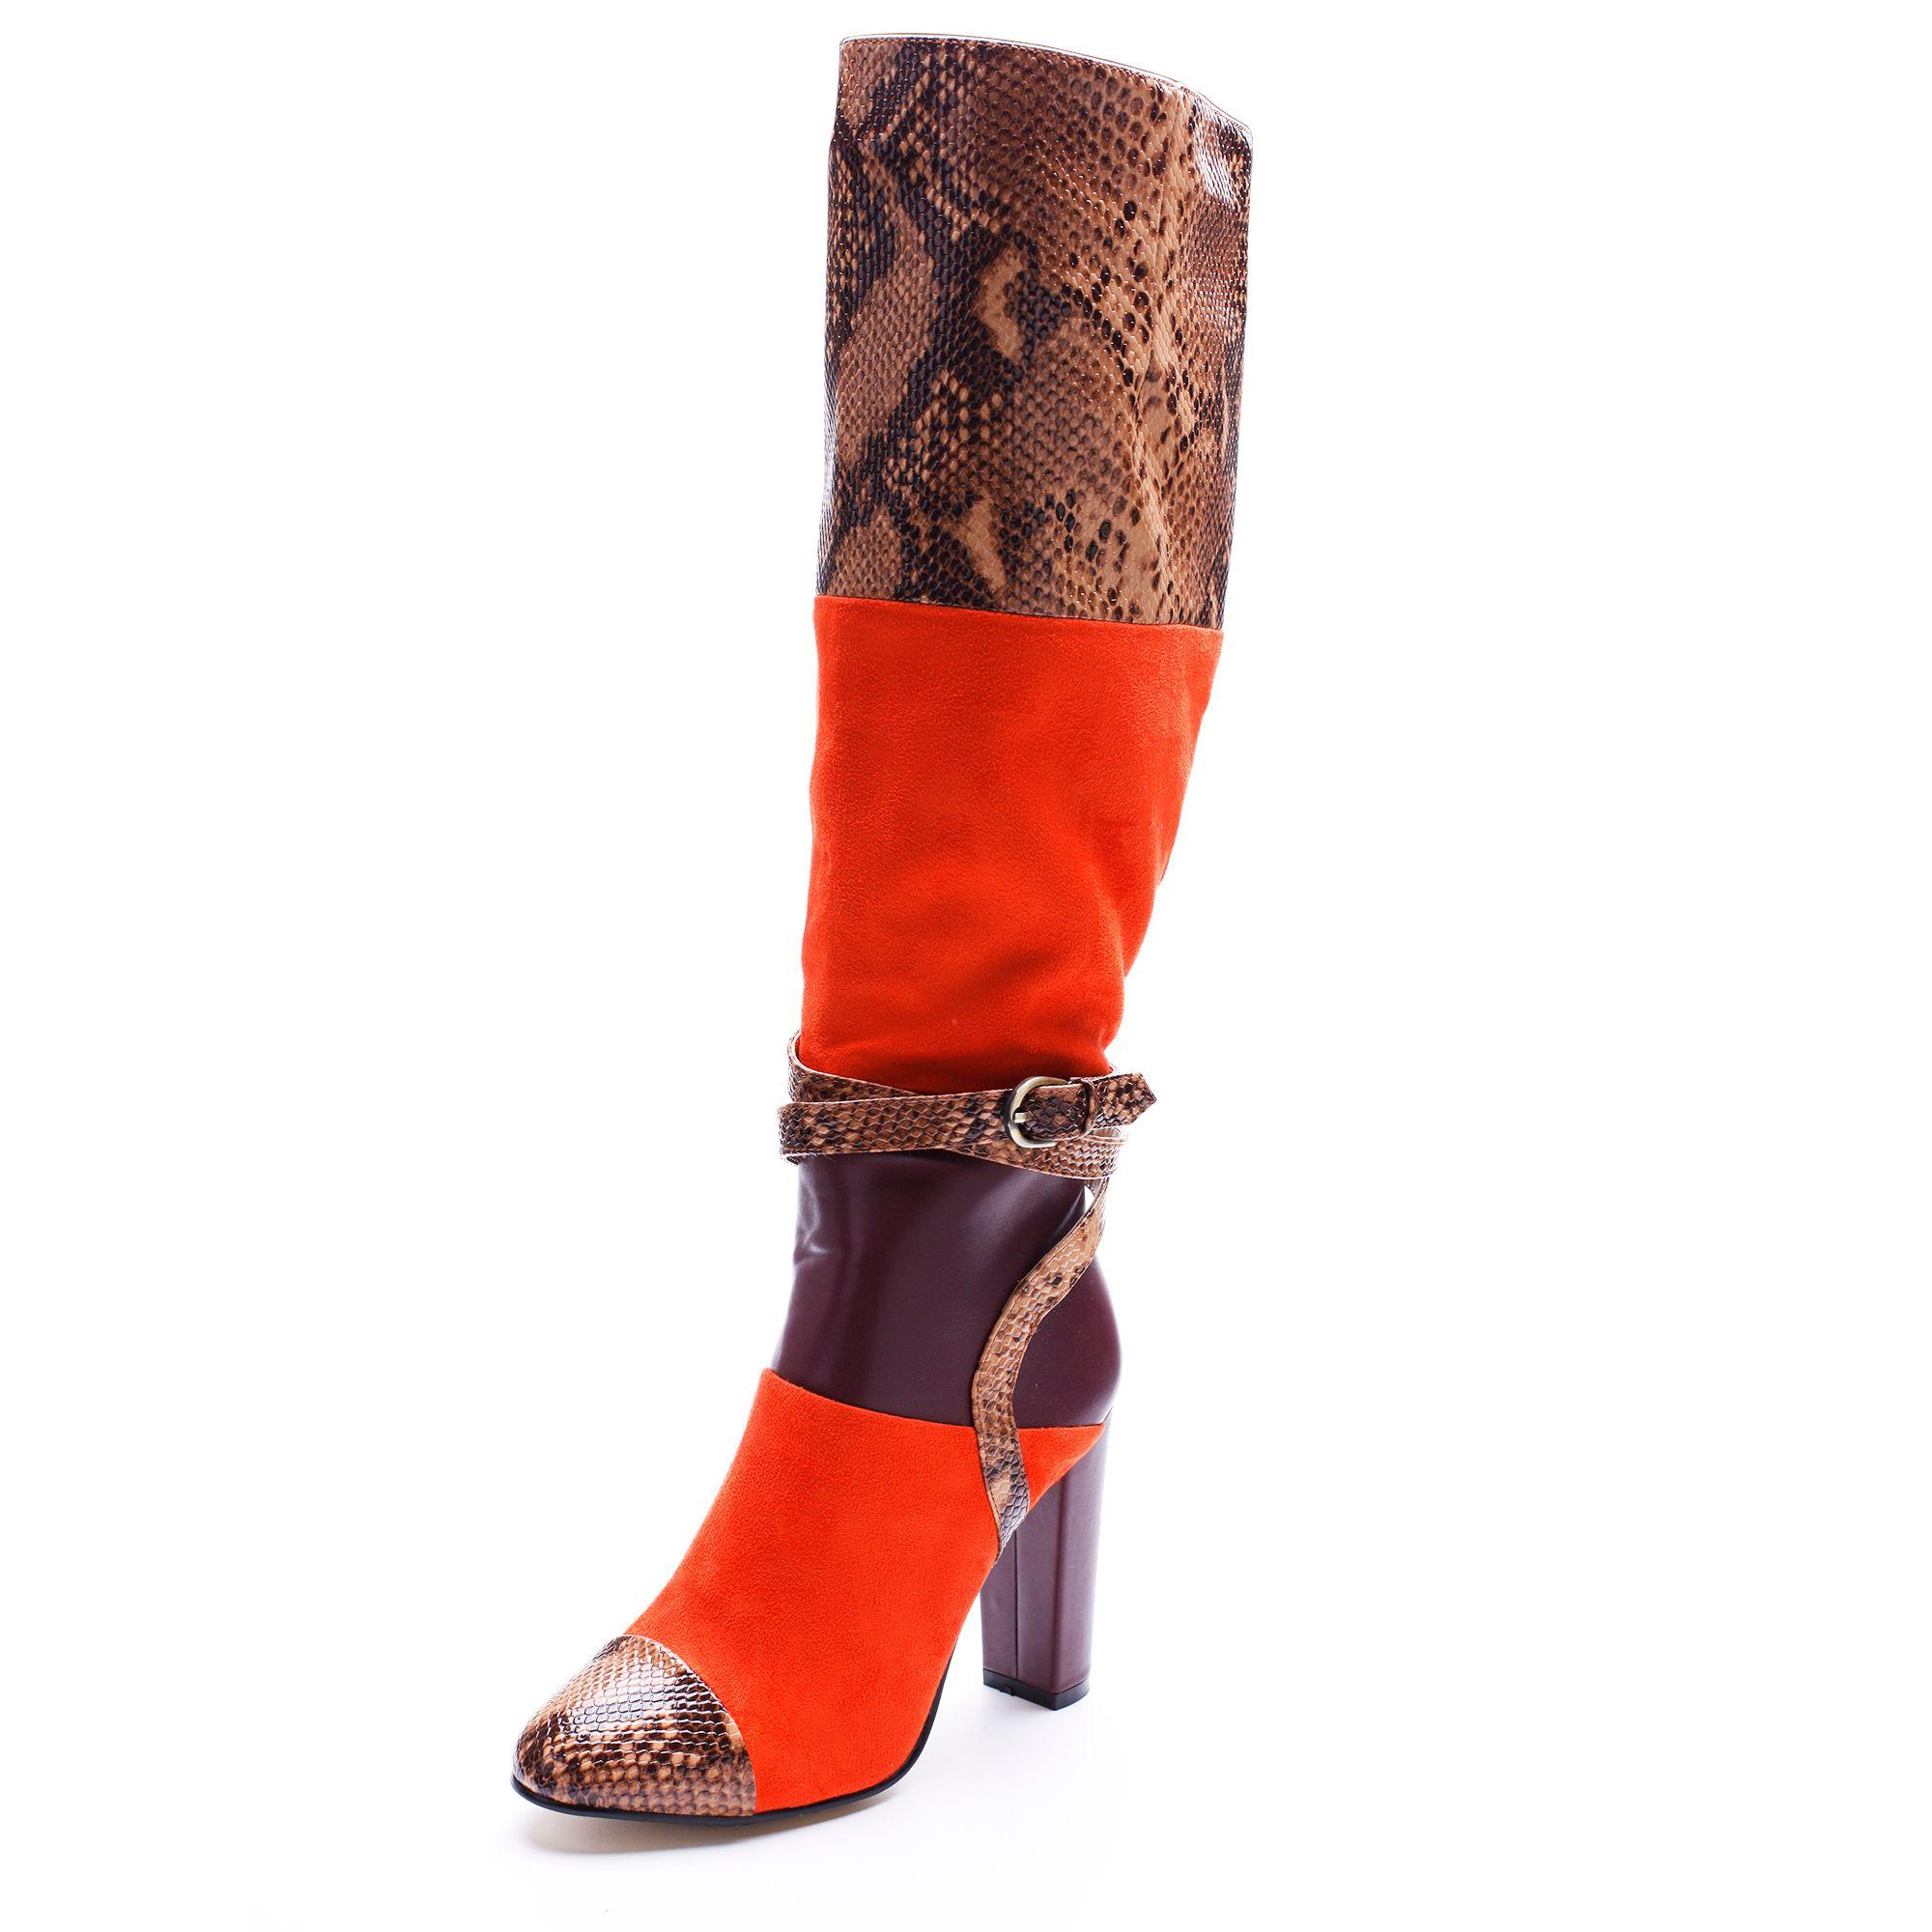 2018 new woke fashion boots toes buckle mixed color zip chunky heel winter women Knee-High Boots high heels women shoes shoes women